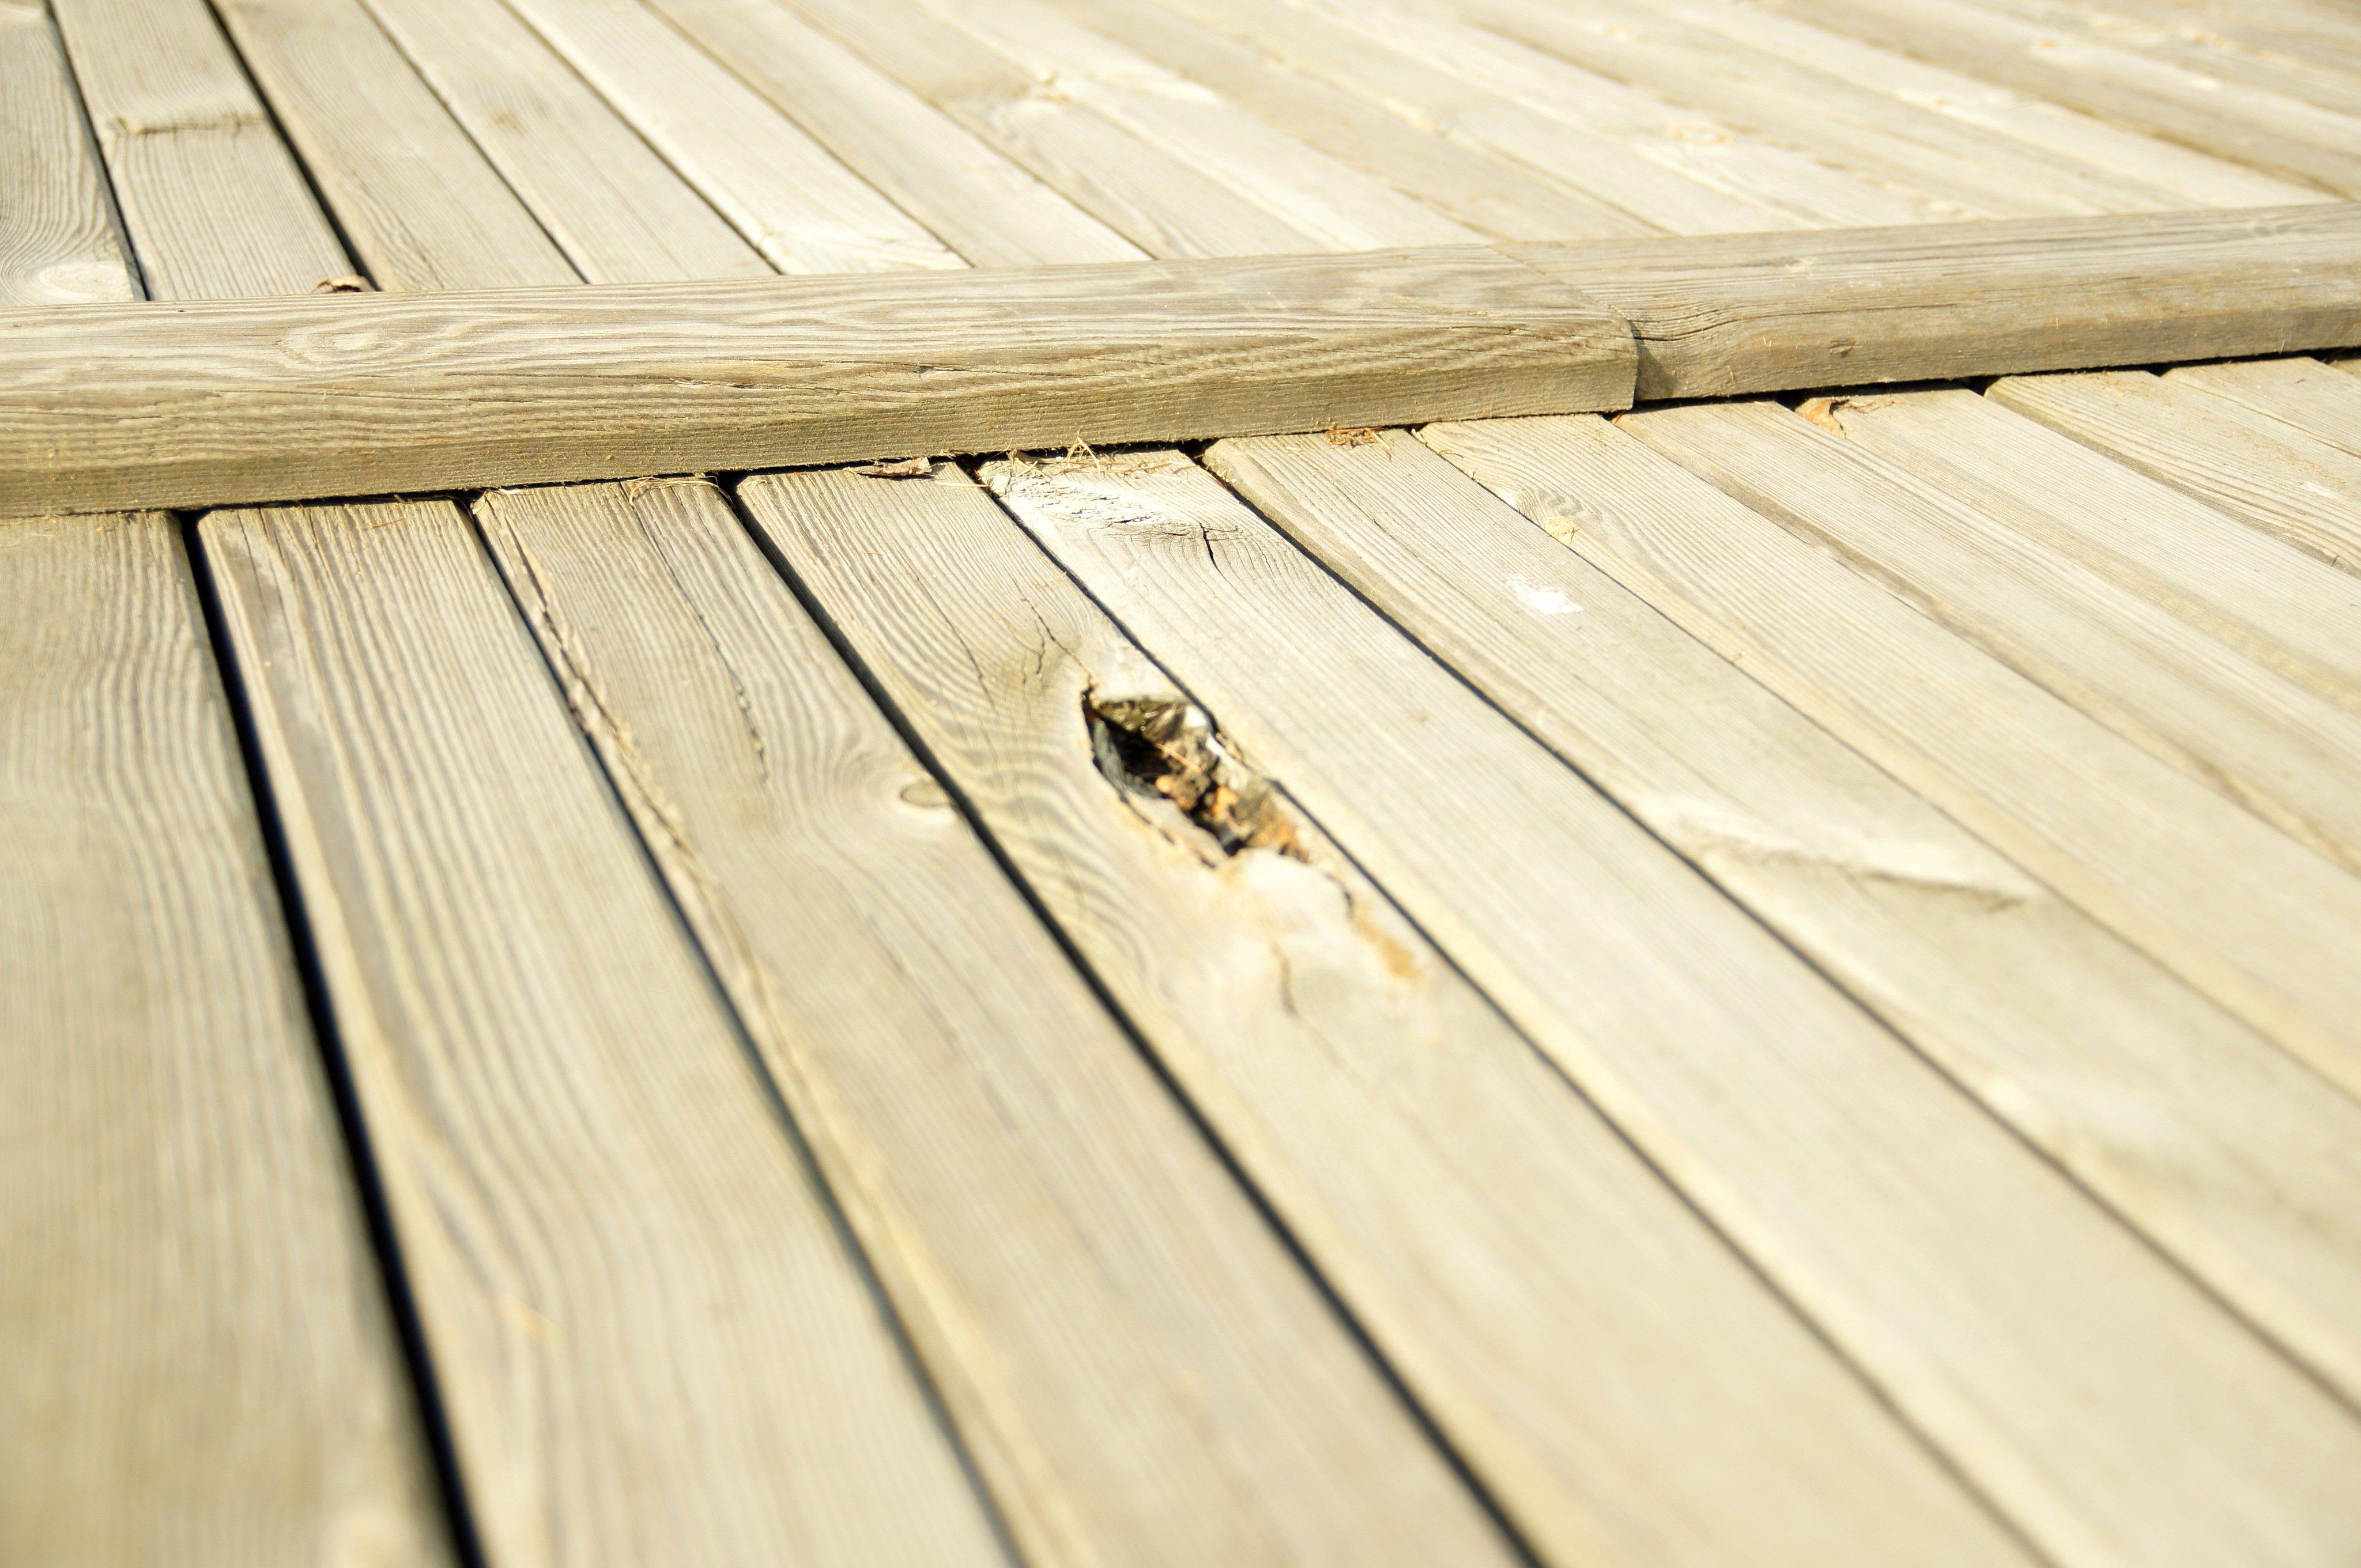 Free picture large wooden platform deck wooden planks